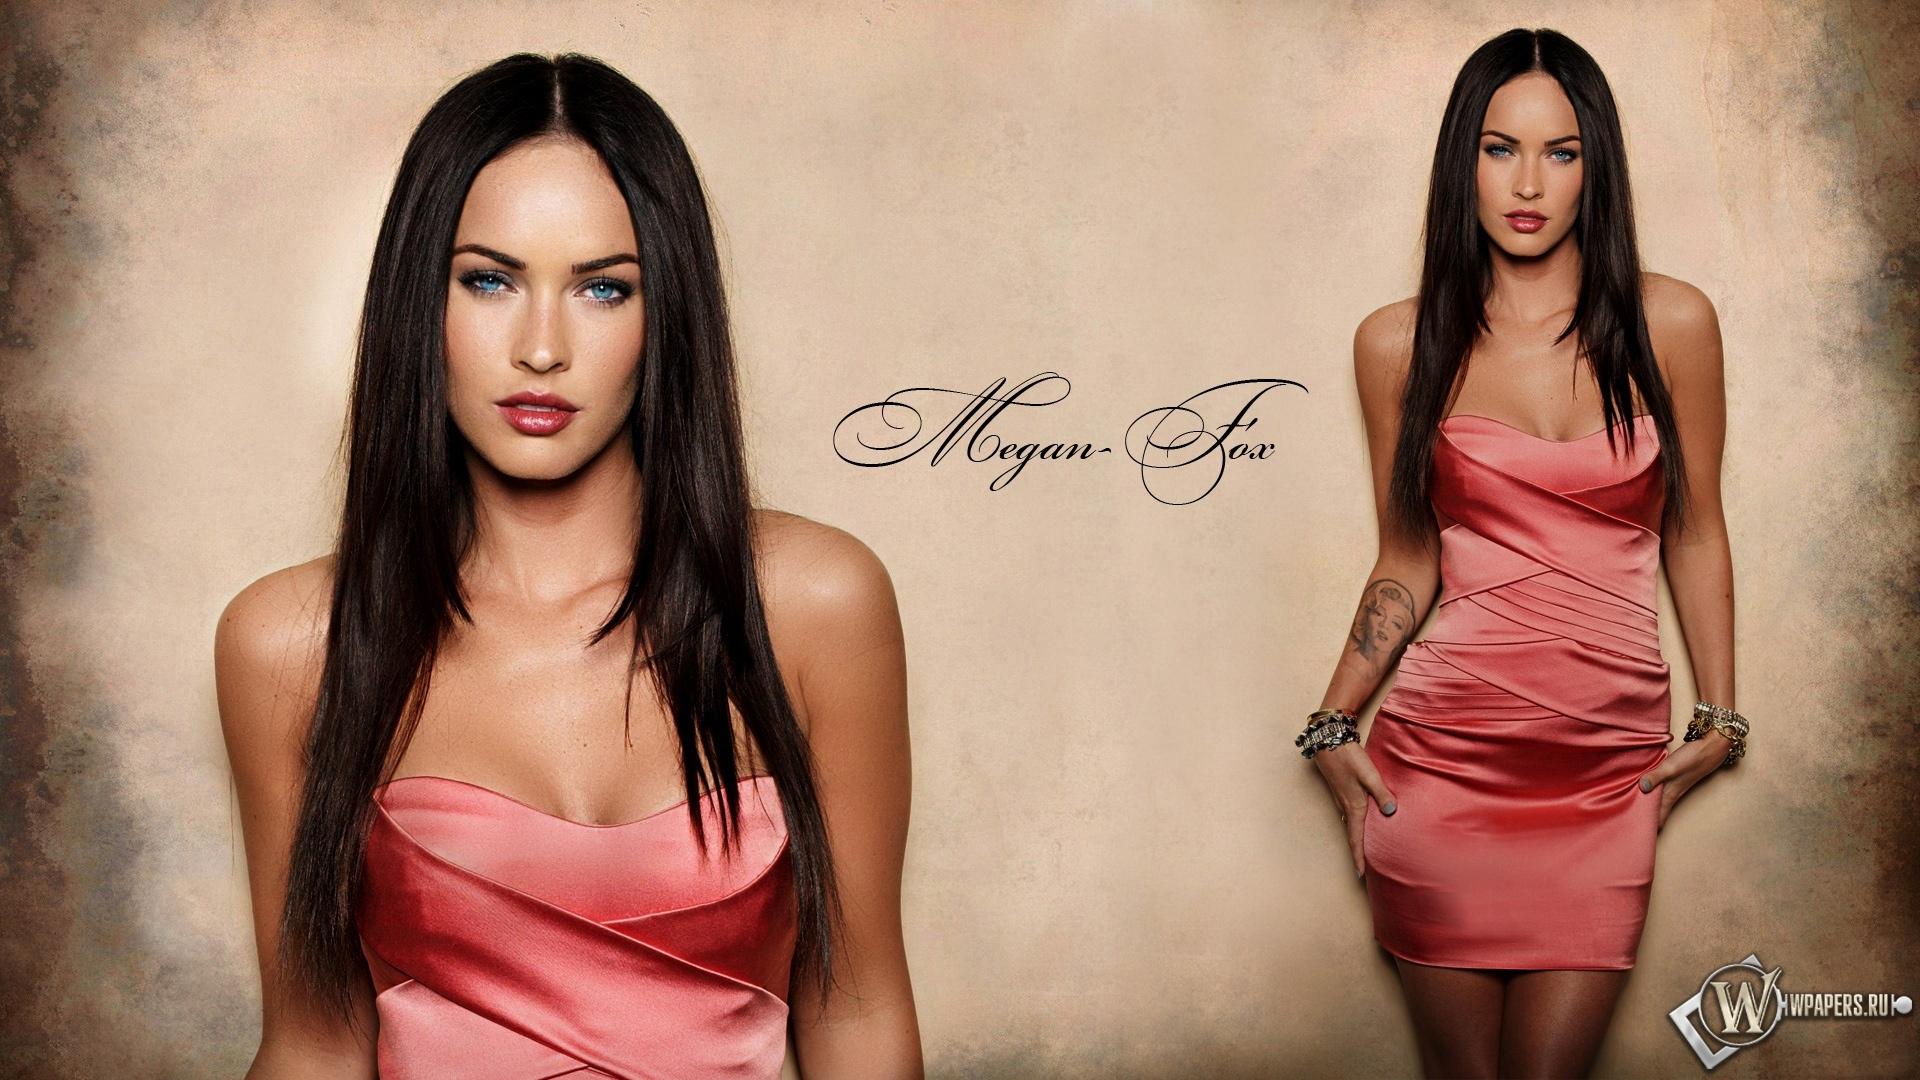 Megan Fox Cosmopolitan 1920x1080